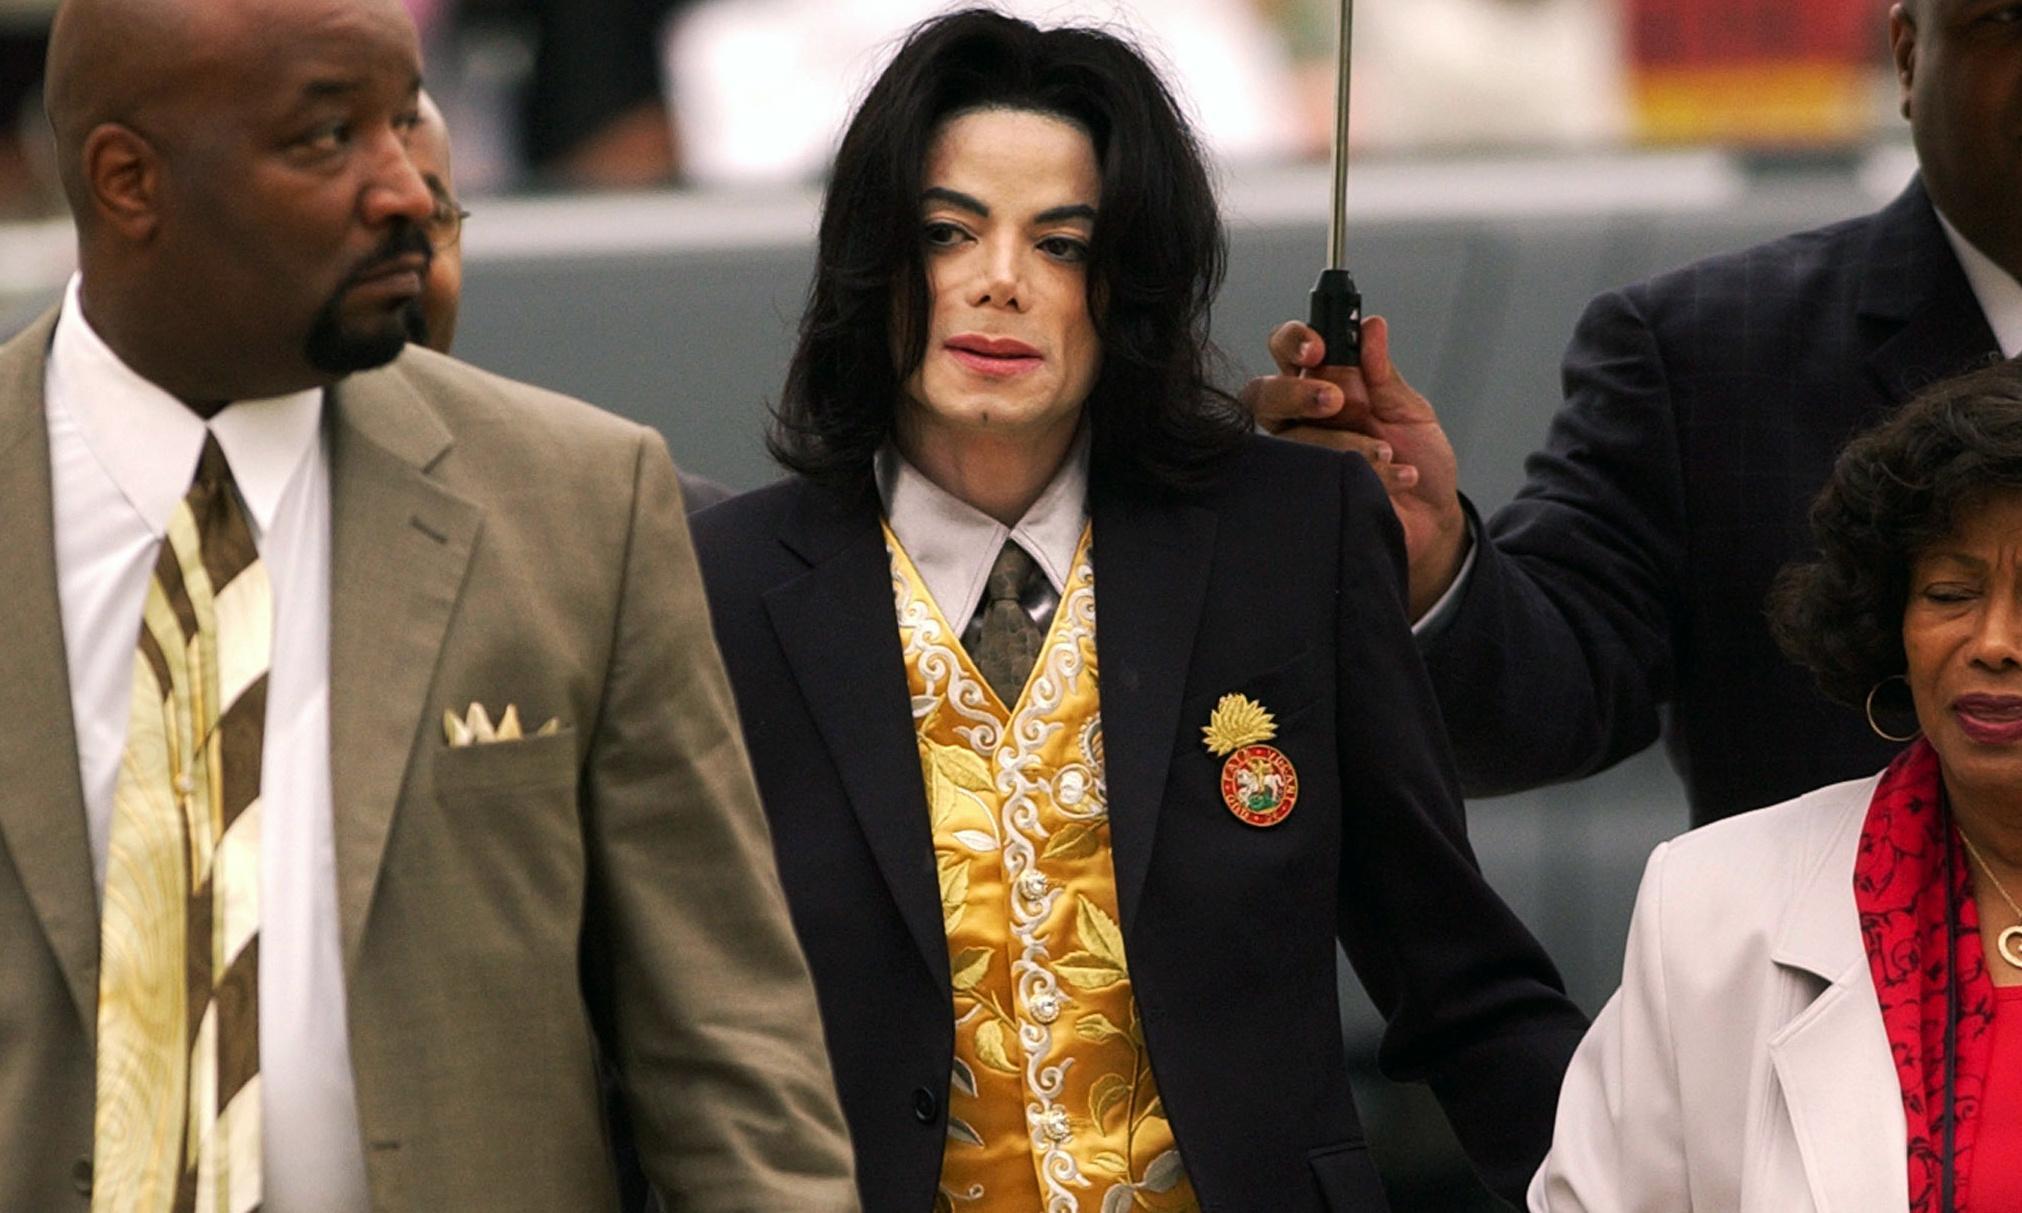 Michael Jackson's family denounces documentary as 'public lynching'